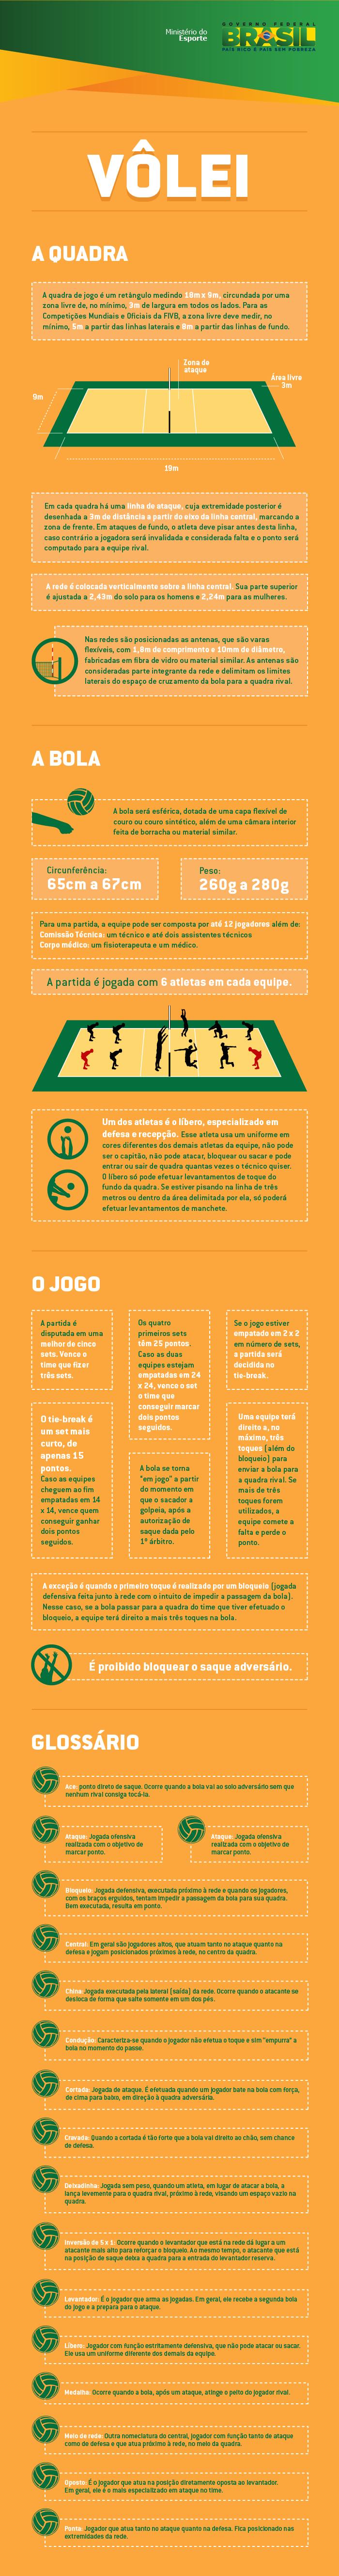 Vôlei — Portal Brasil 2016